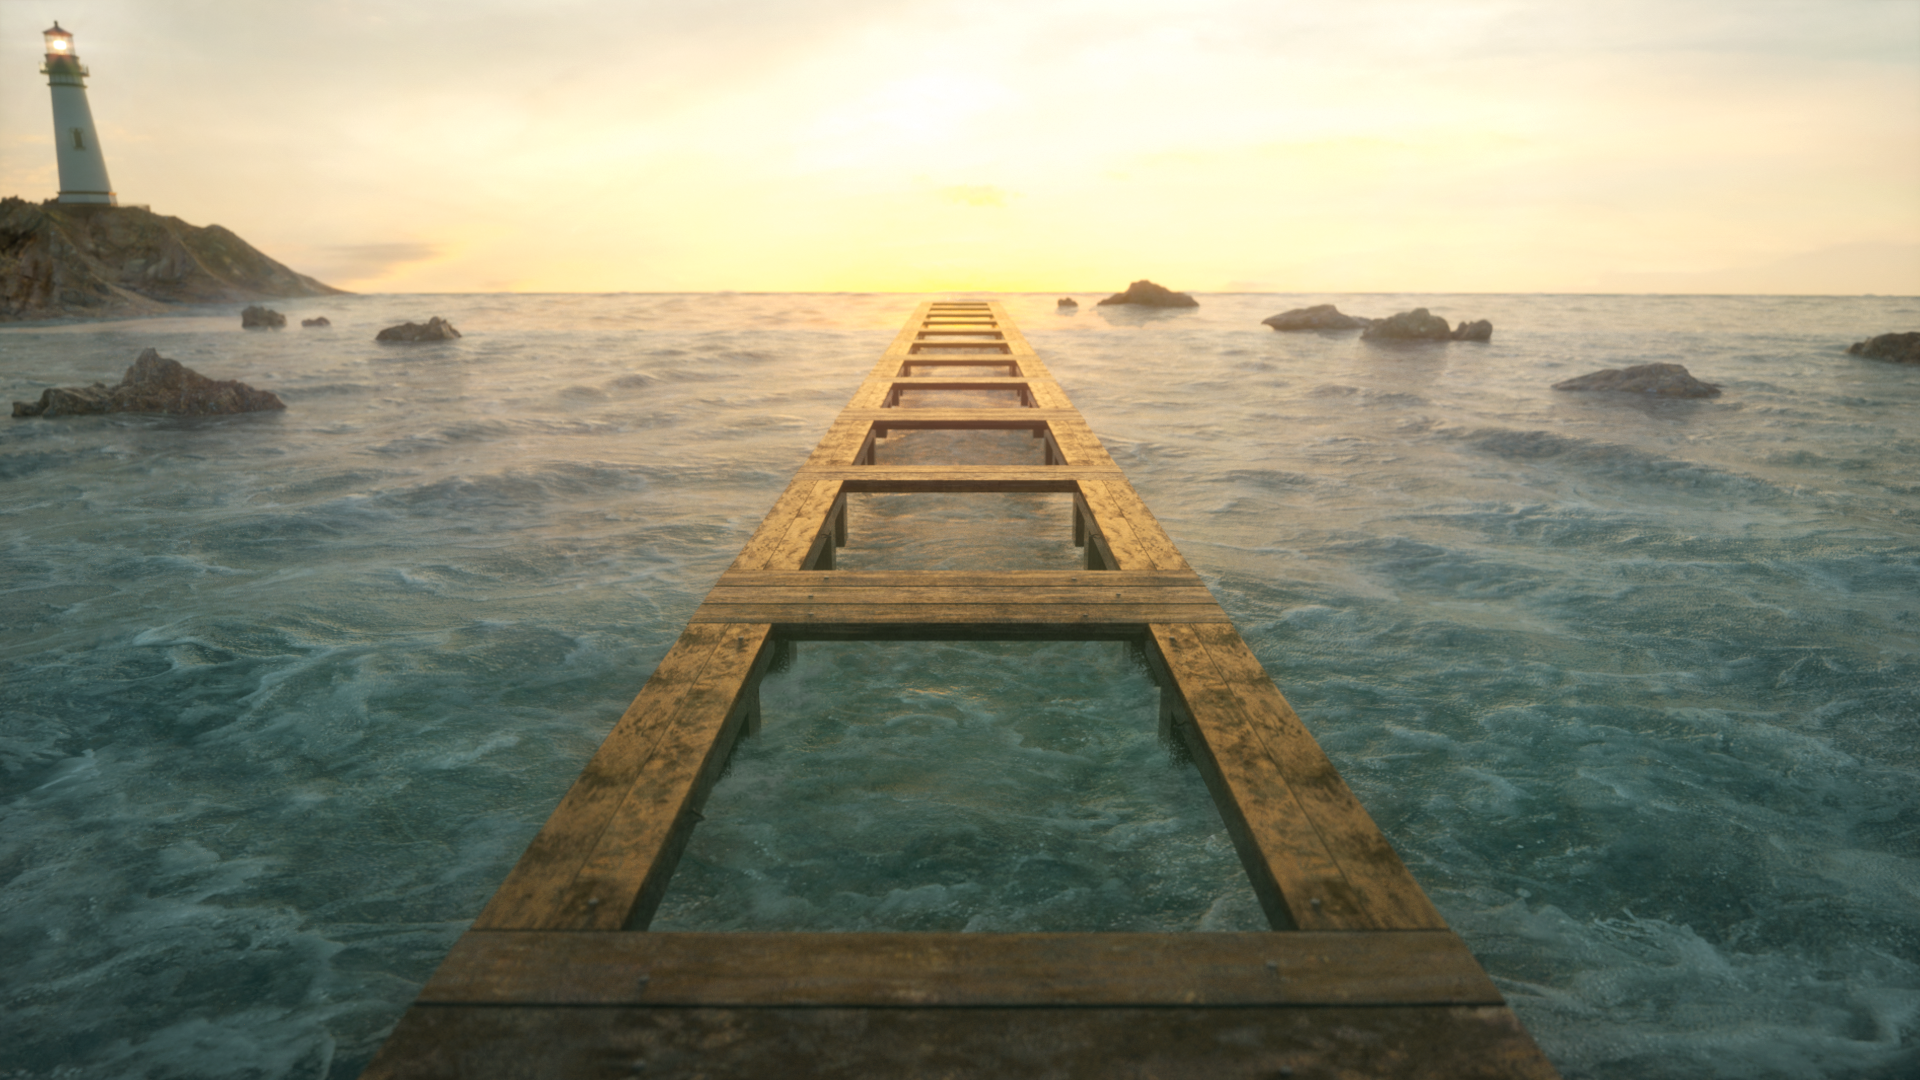 General 1920x1080 sea sea foam landscape planks water path pathway sunlight shining lighthouse rocks grunge 3D graphics CGI rendering flares soft gradient